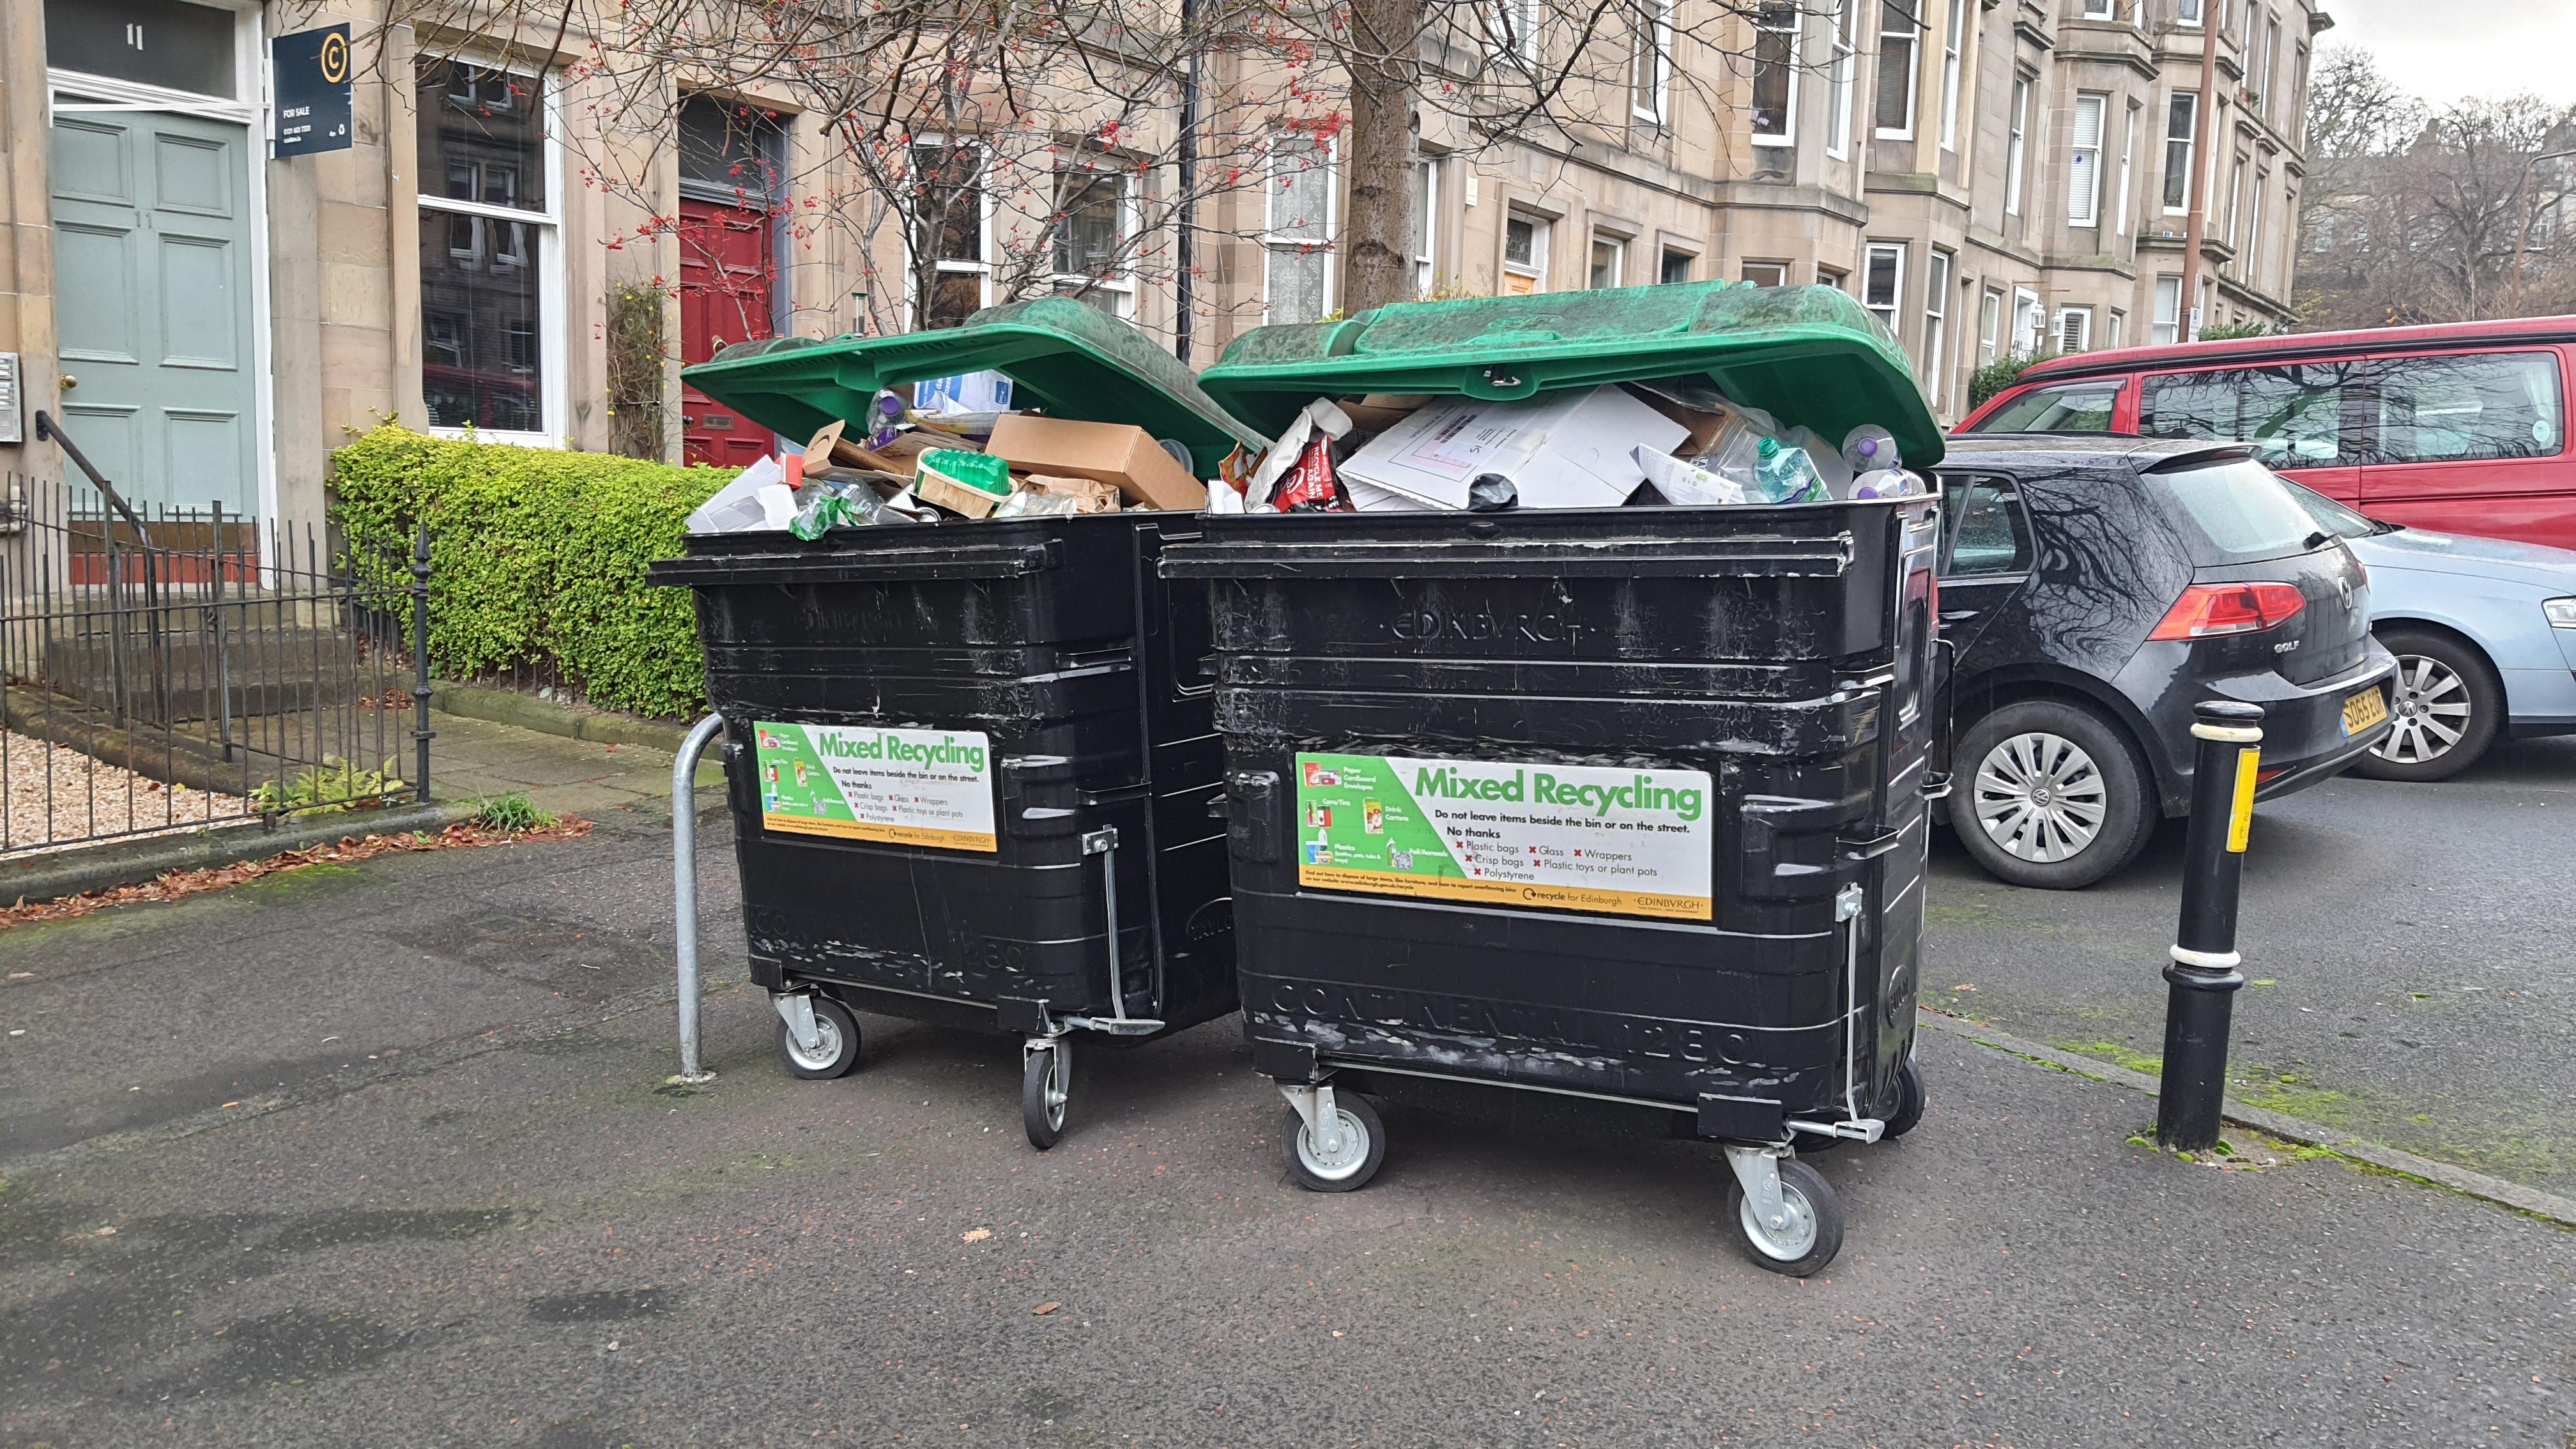 'Pitiful' to blame COVID for falling Edinburgh recycling rates, say Lib Dems